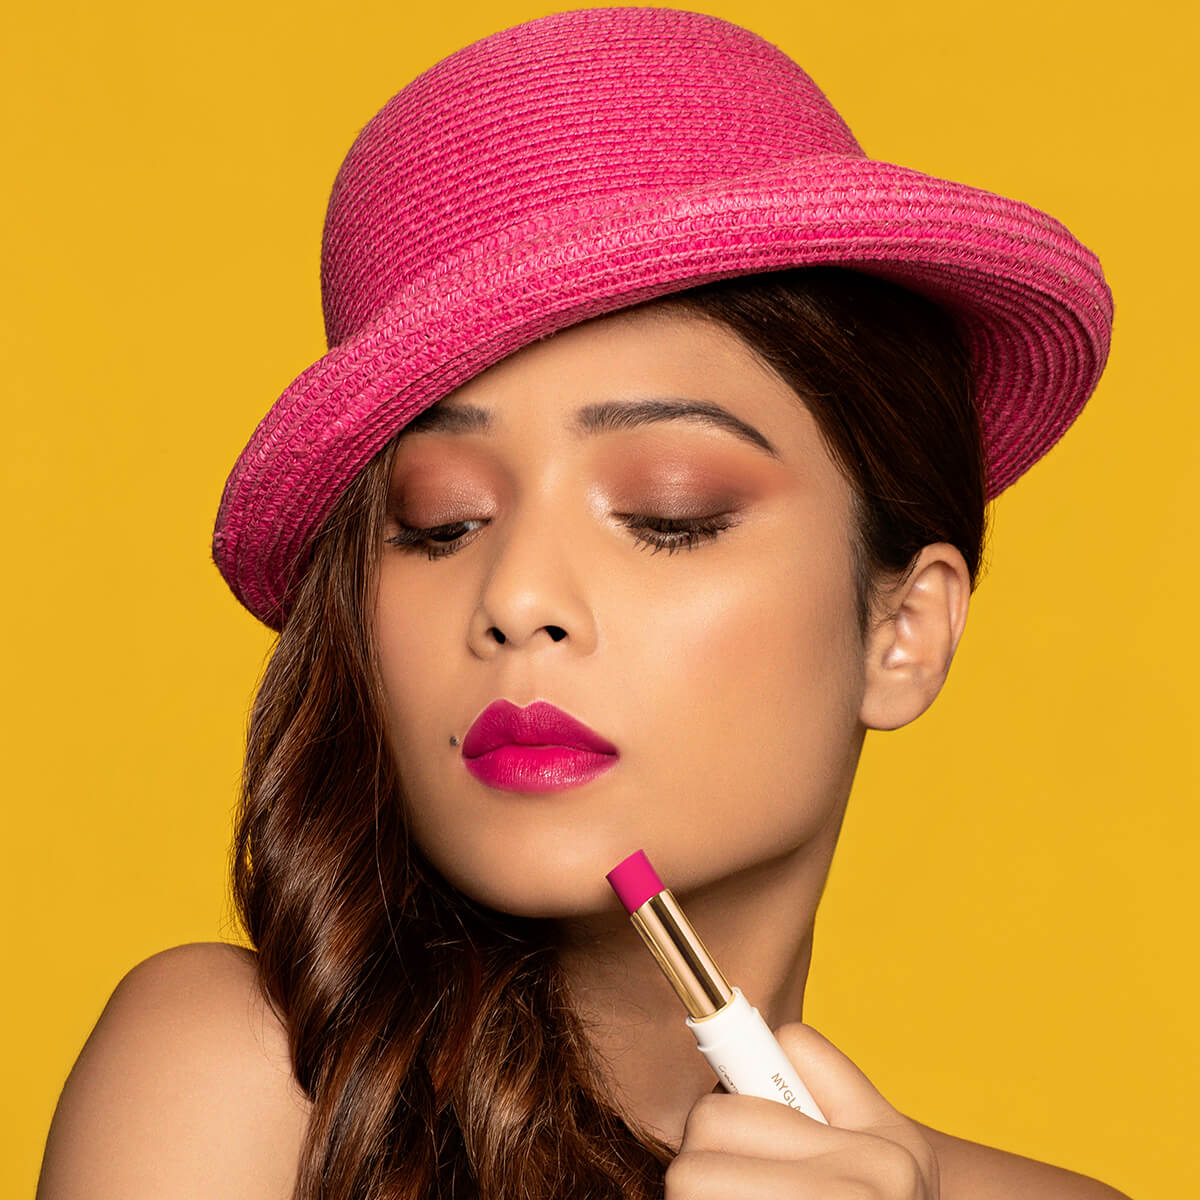 Lit Creamy Matte Lipsticks